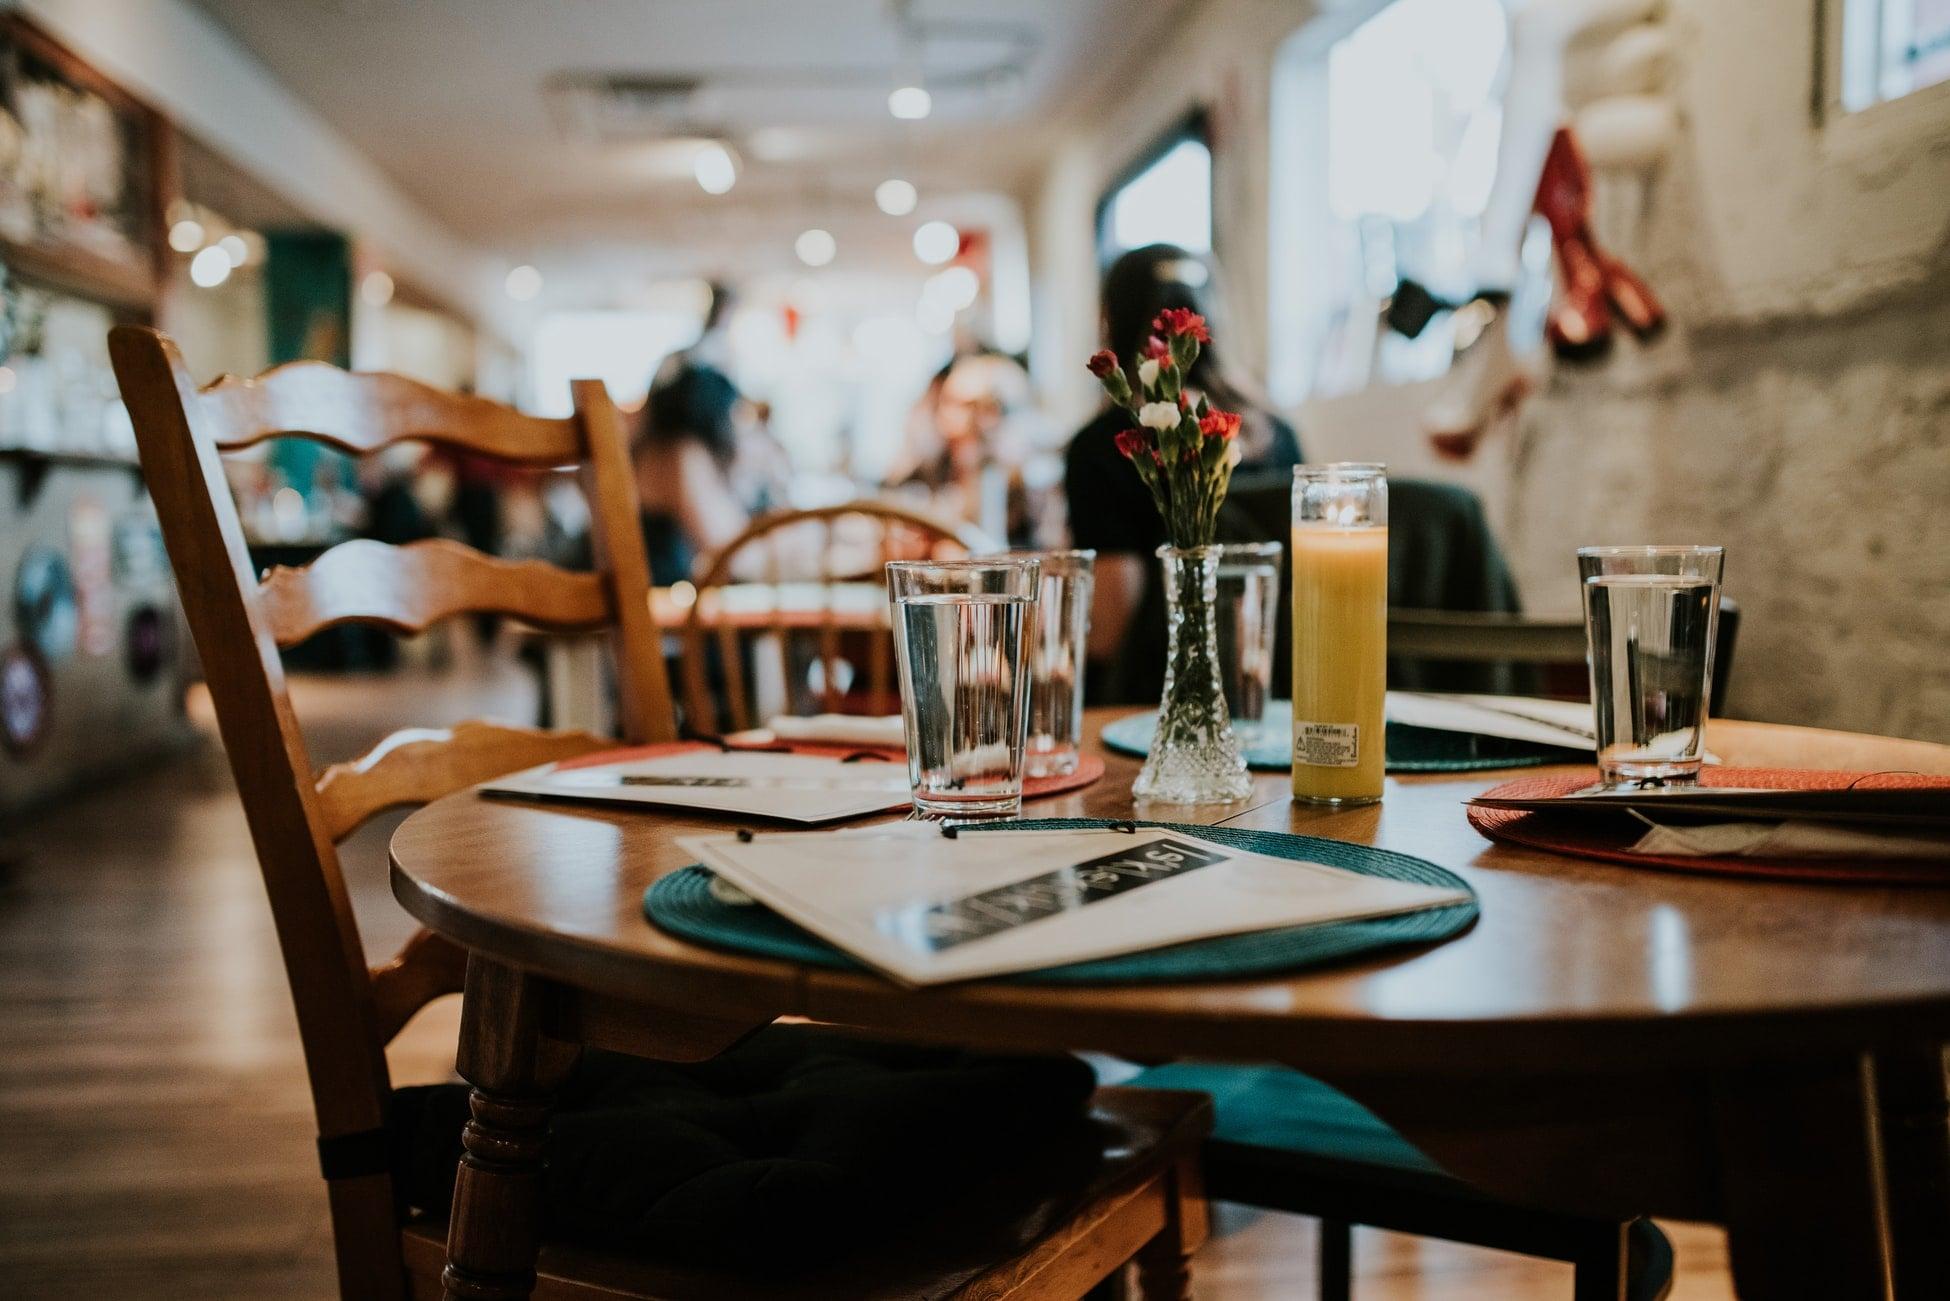 idei de marketing online pentru restaurante, interior local